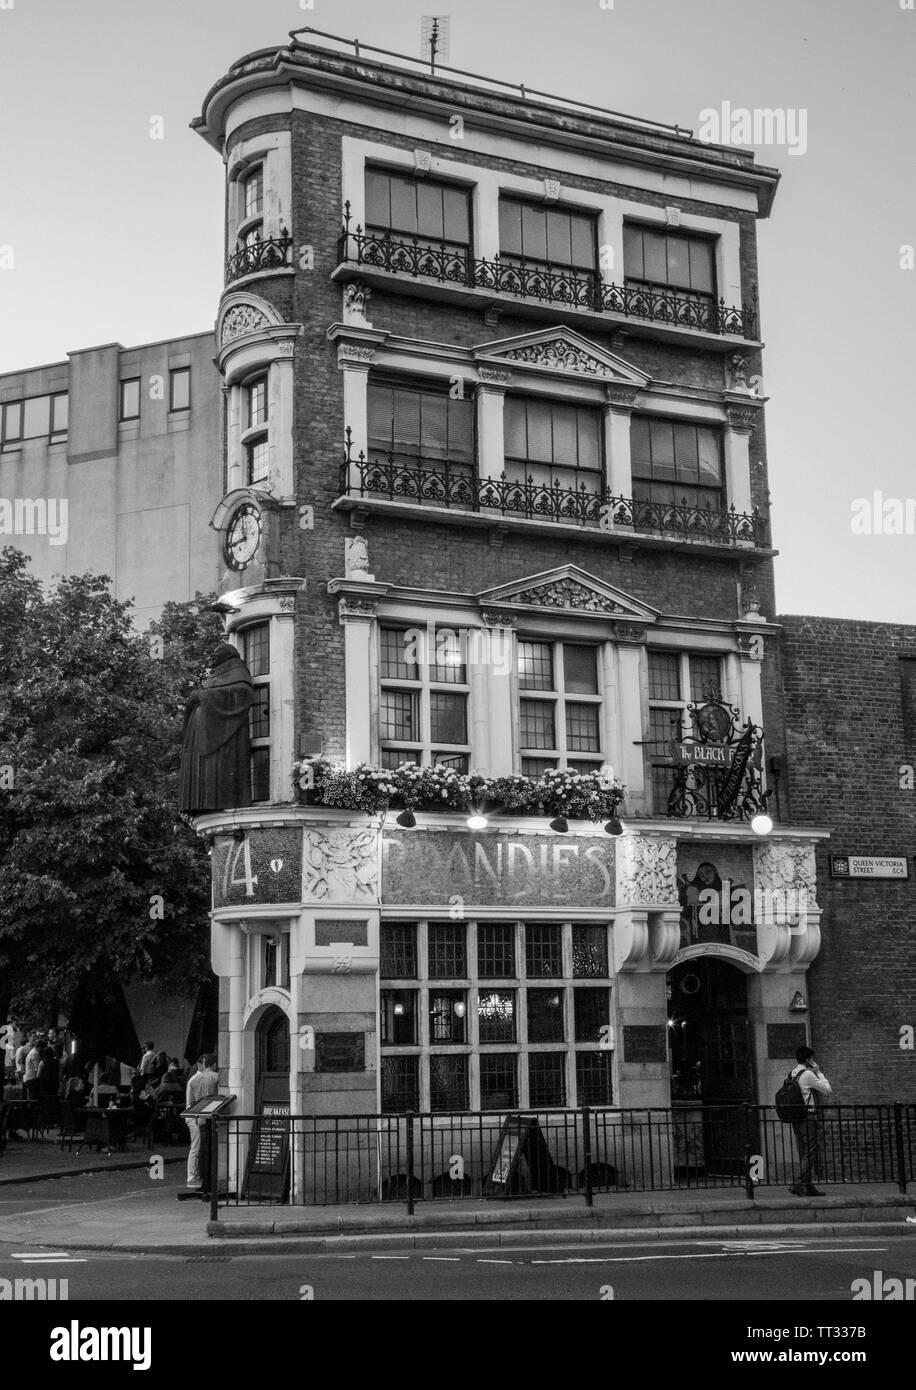 The Blackfriar Public House, London - Stock Image